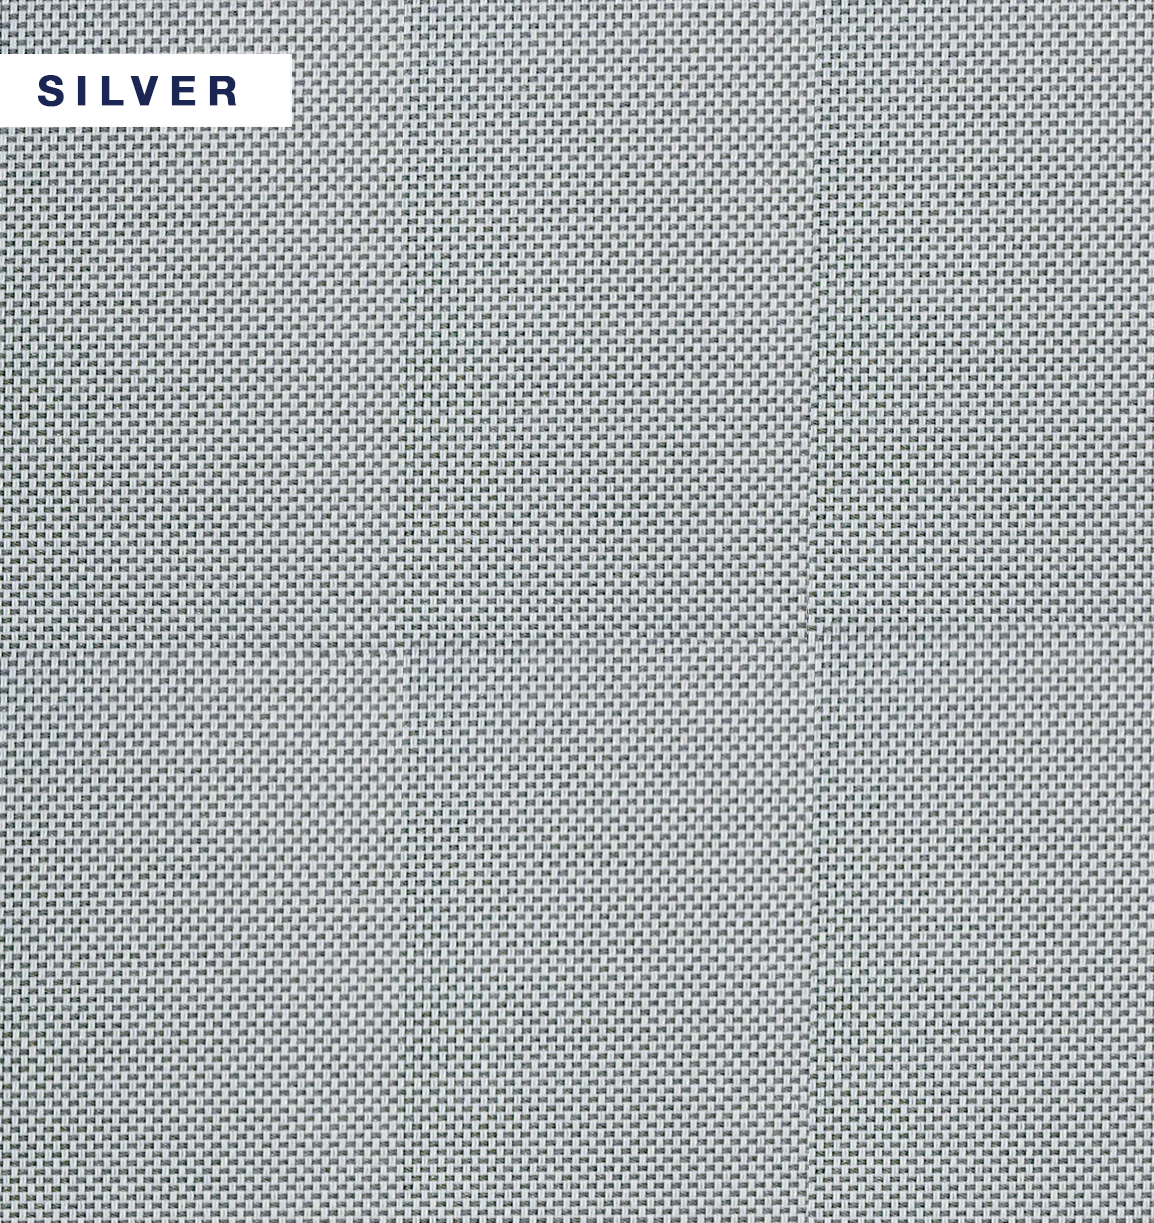 Phoenix - Silver.jpg